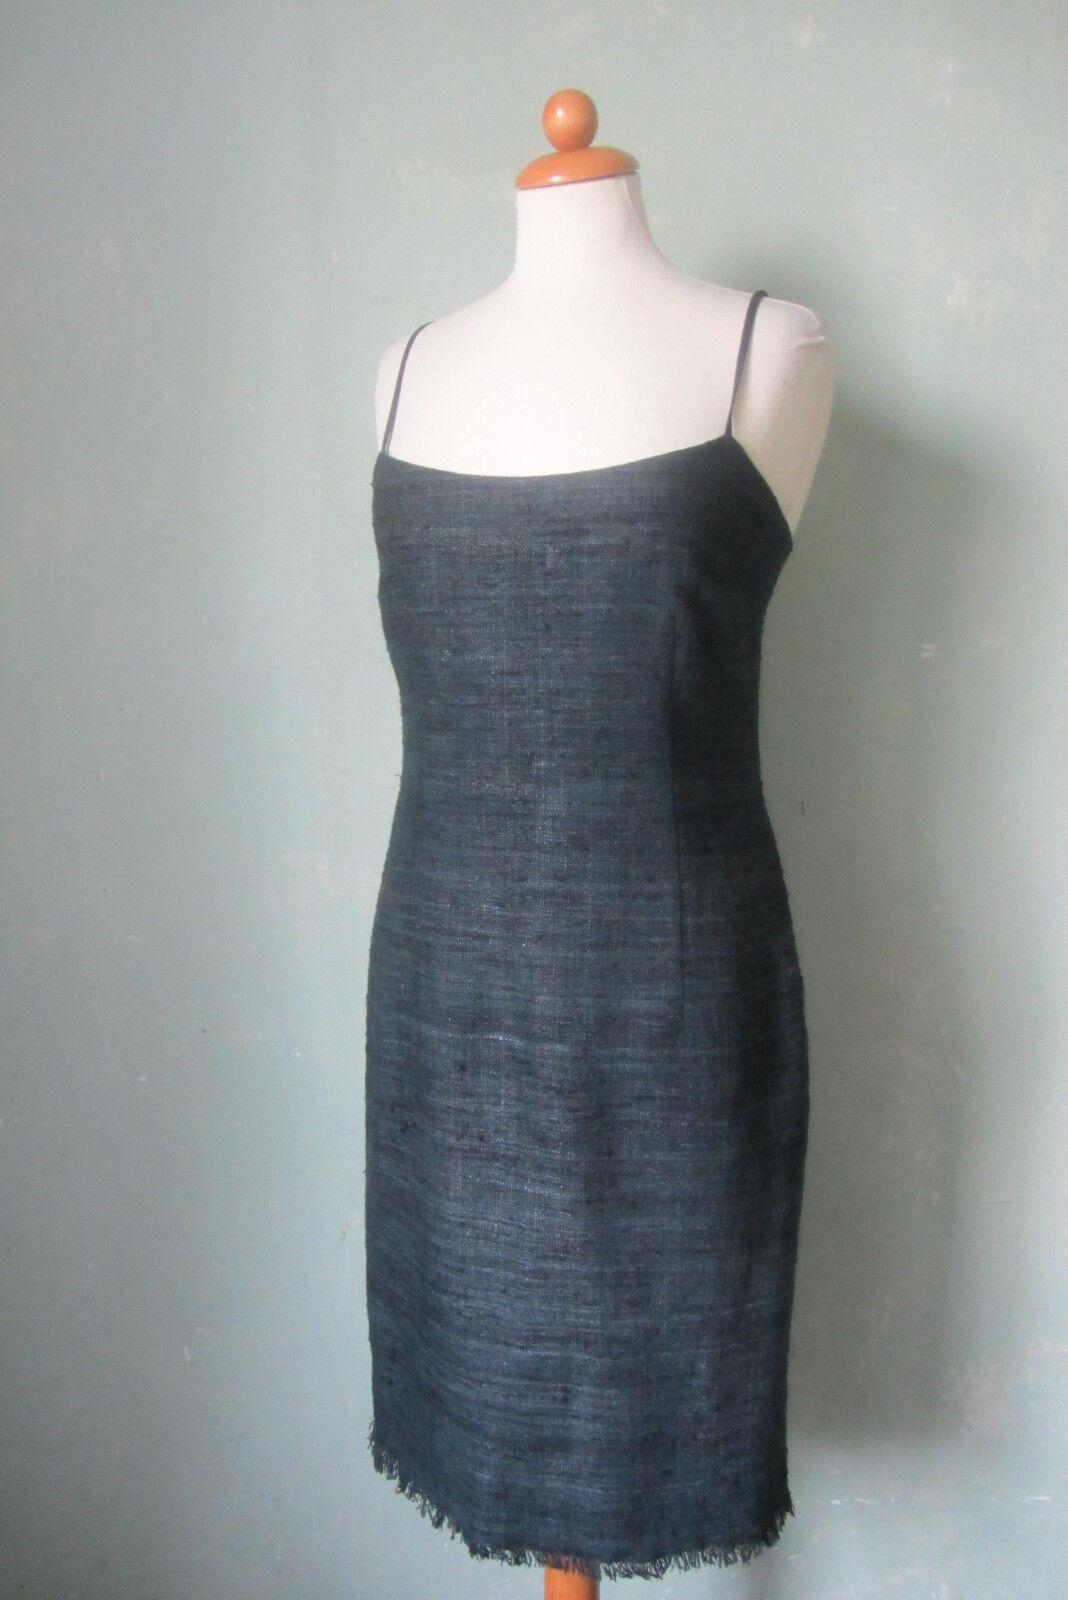 Strenesse Blau Kleid Sommerkleid Dunkelblau dünne Träger eng Größe 36 S (KL3)